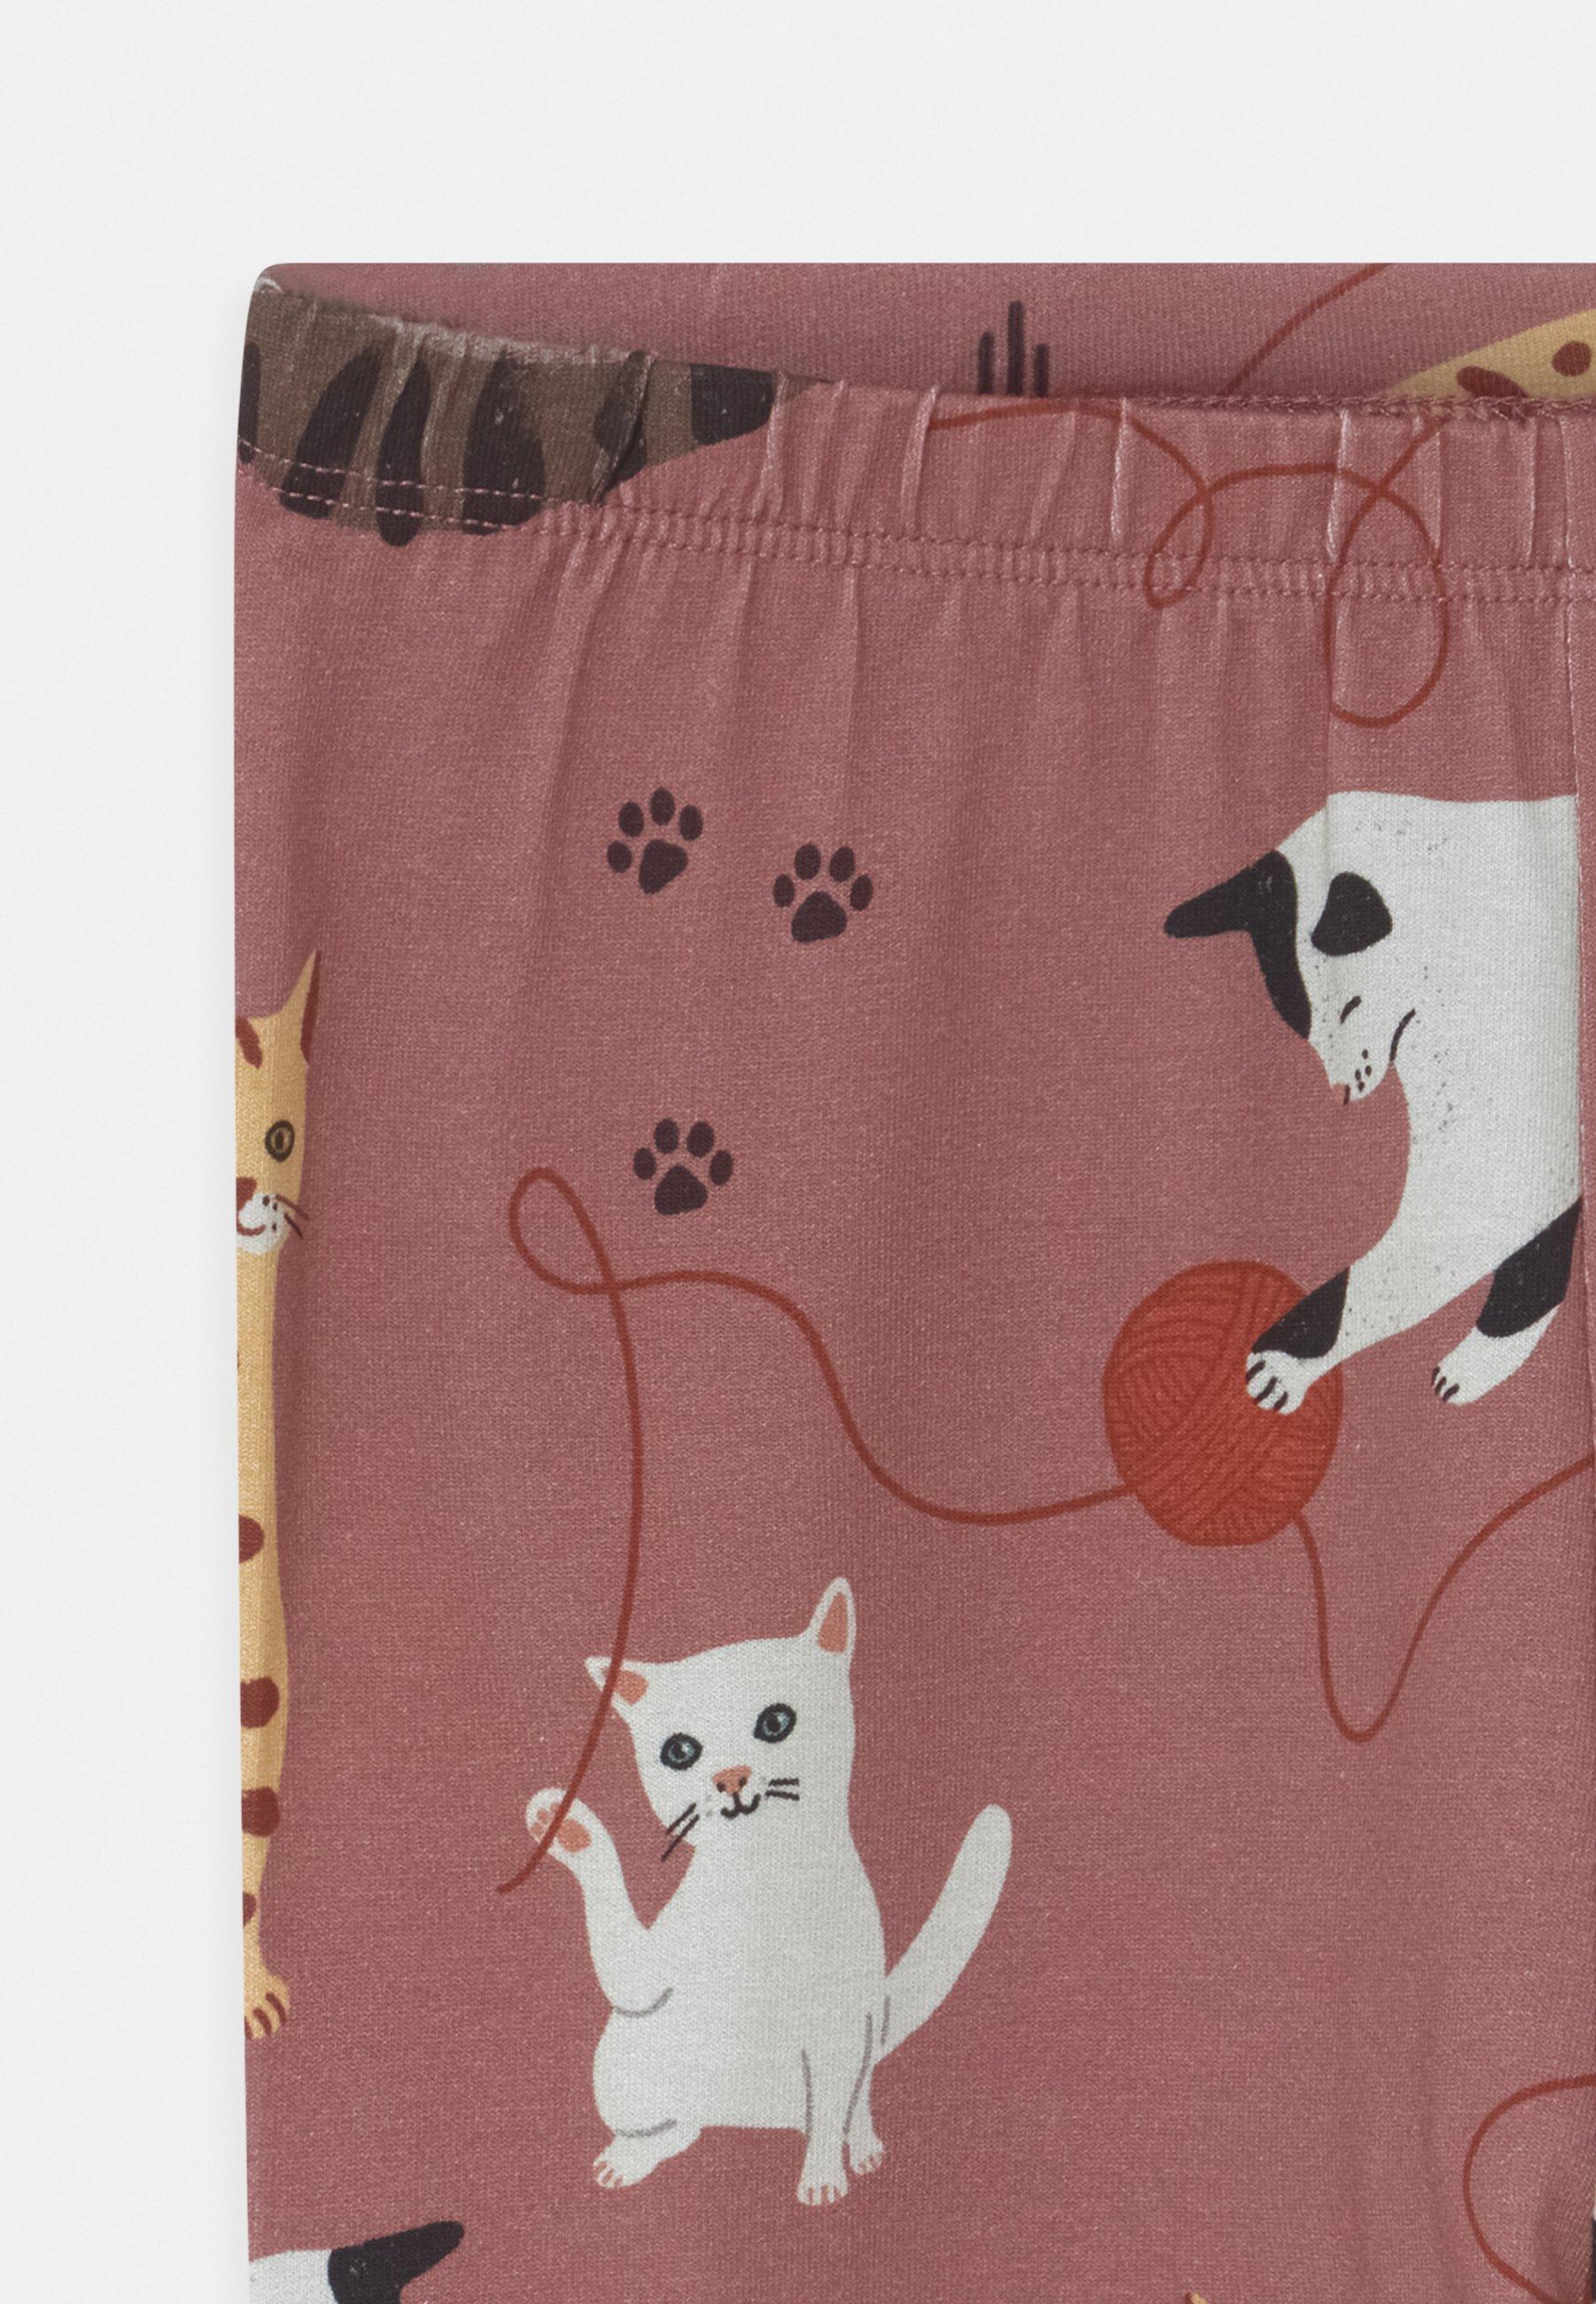 Kids PLAYFUL CATS - Leggings - Trousers